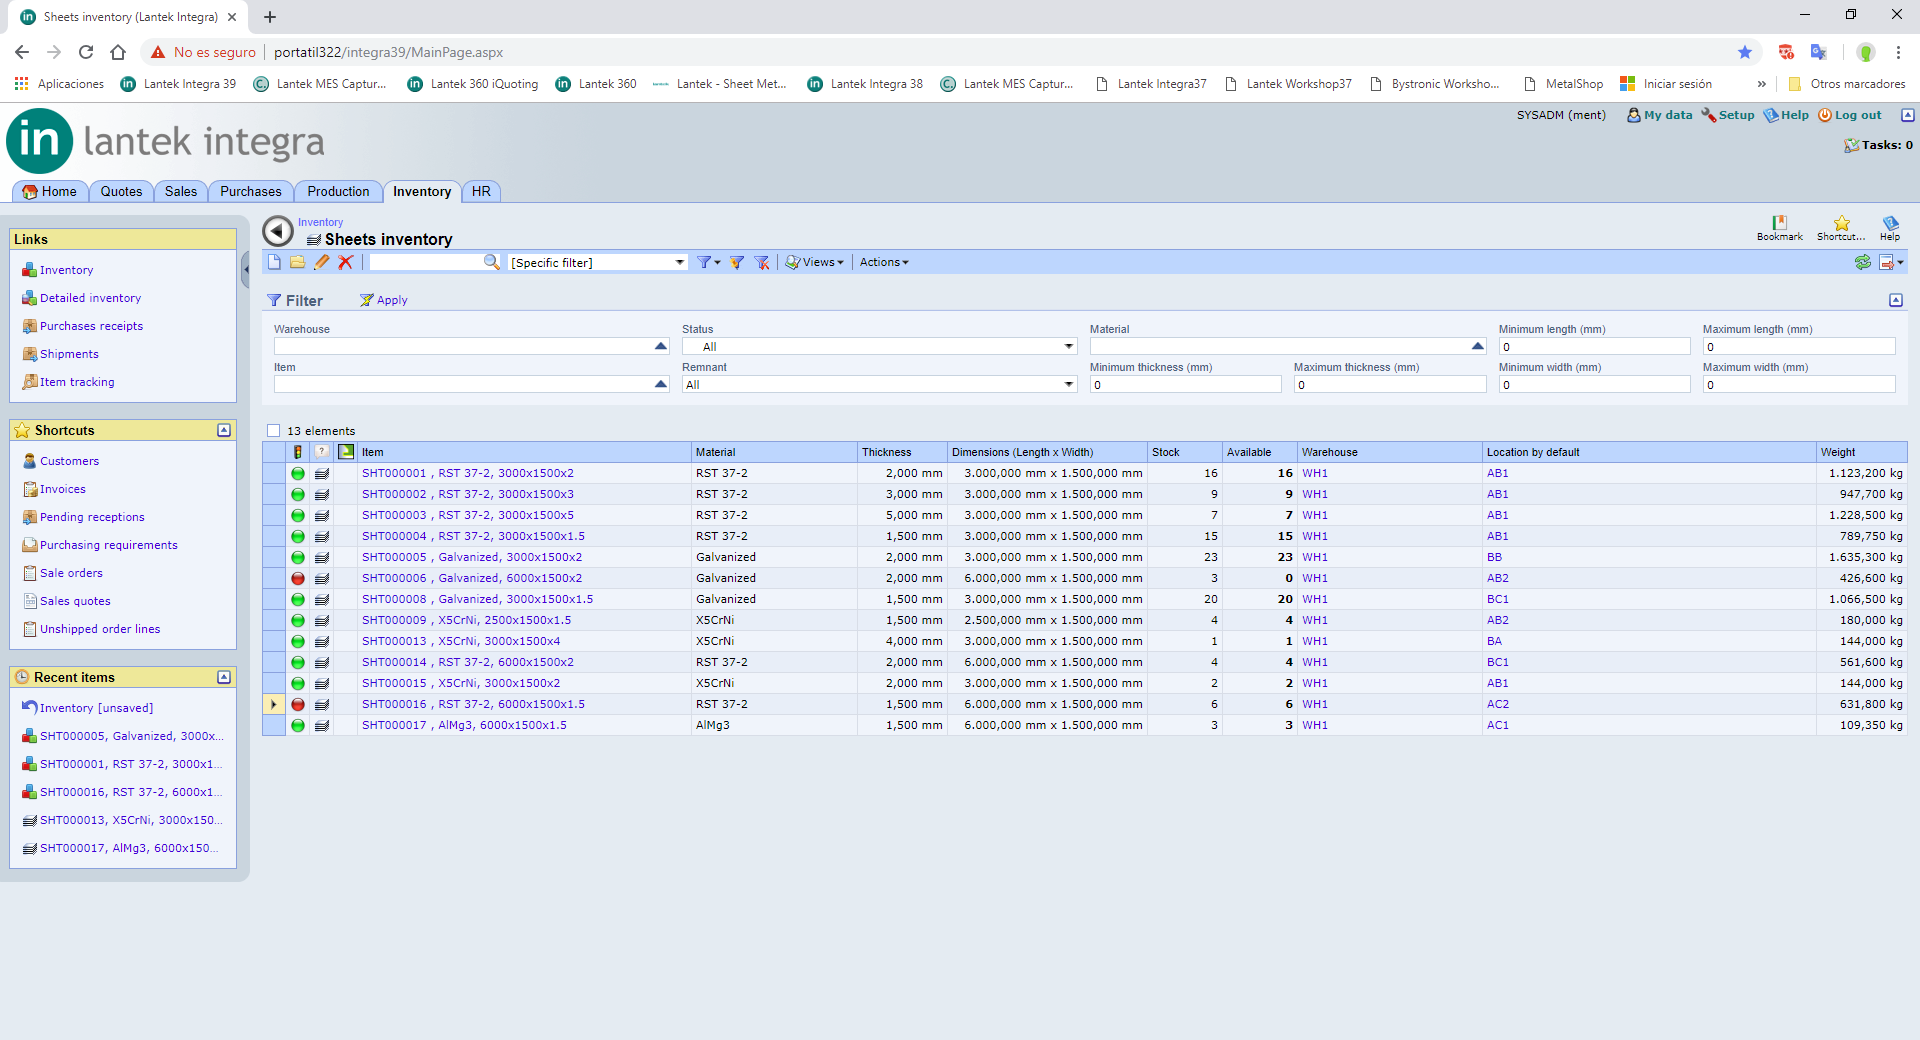 Lantek Integra Inventory  - Przesunięcia